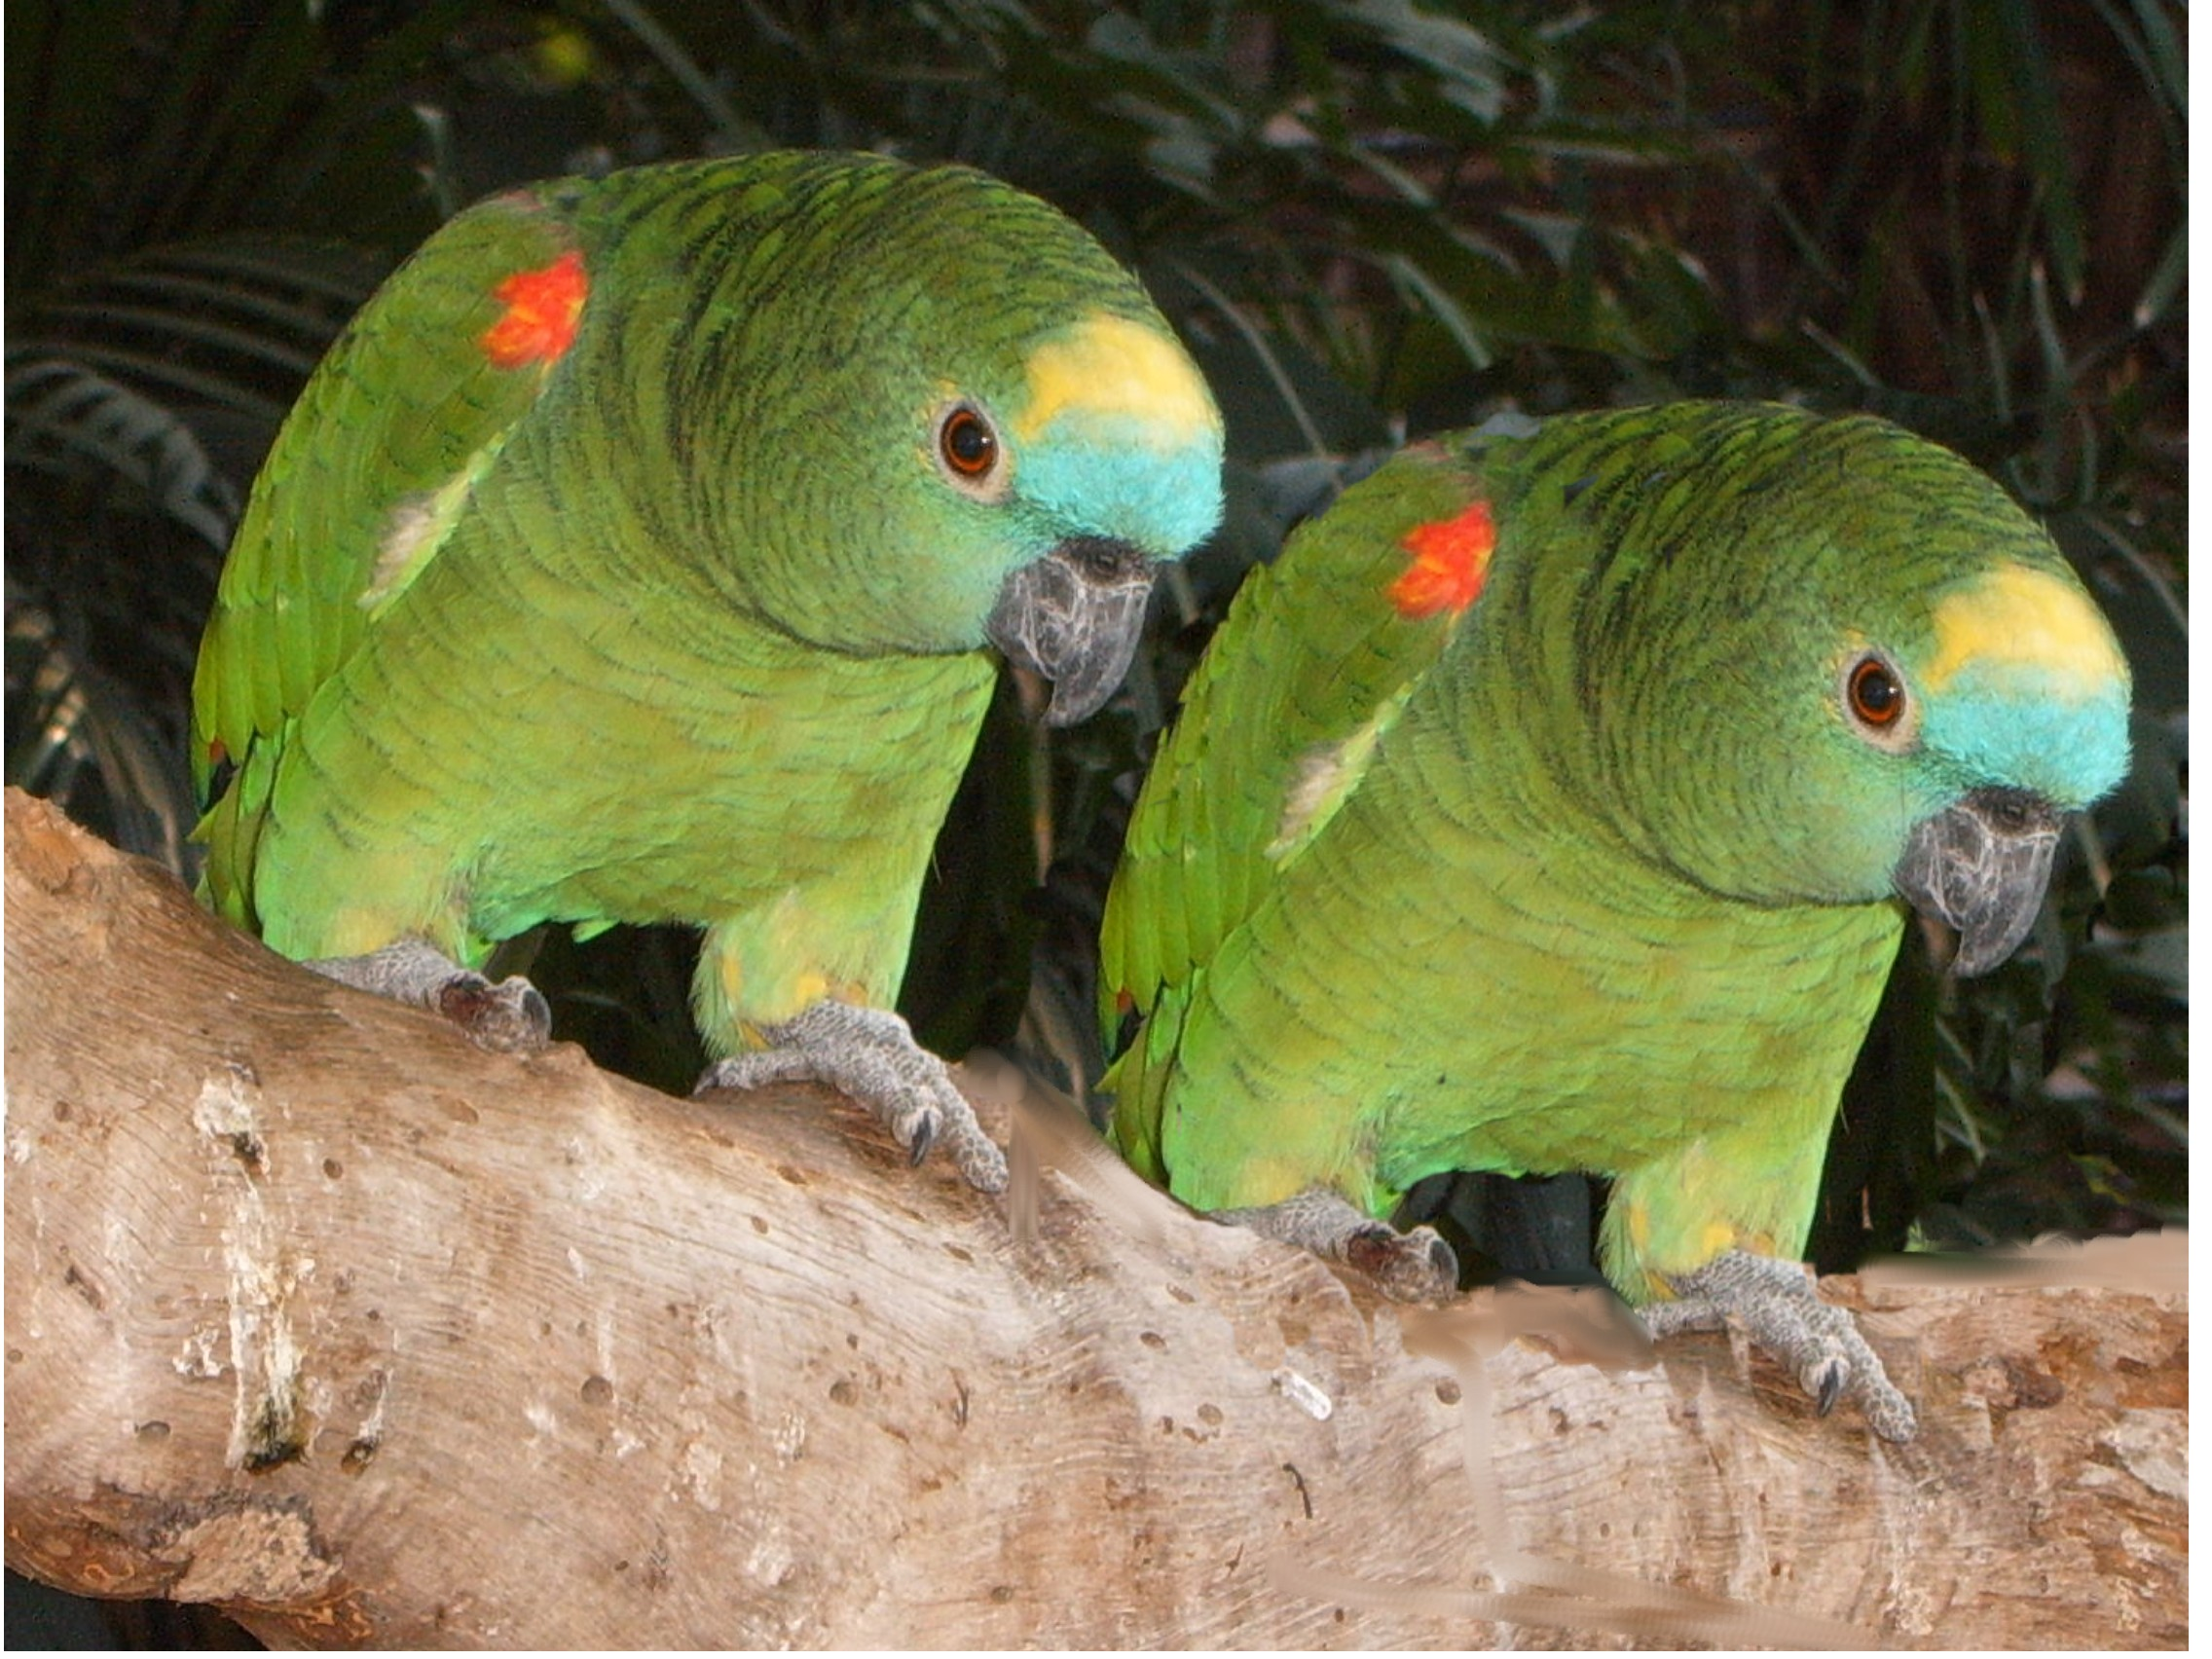 Umgeni River Bird Park in Durban